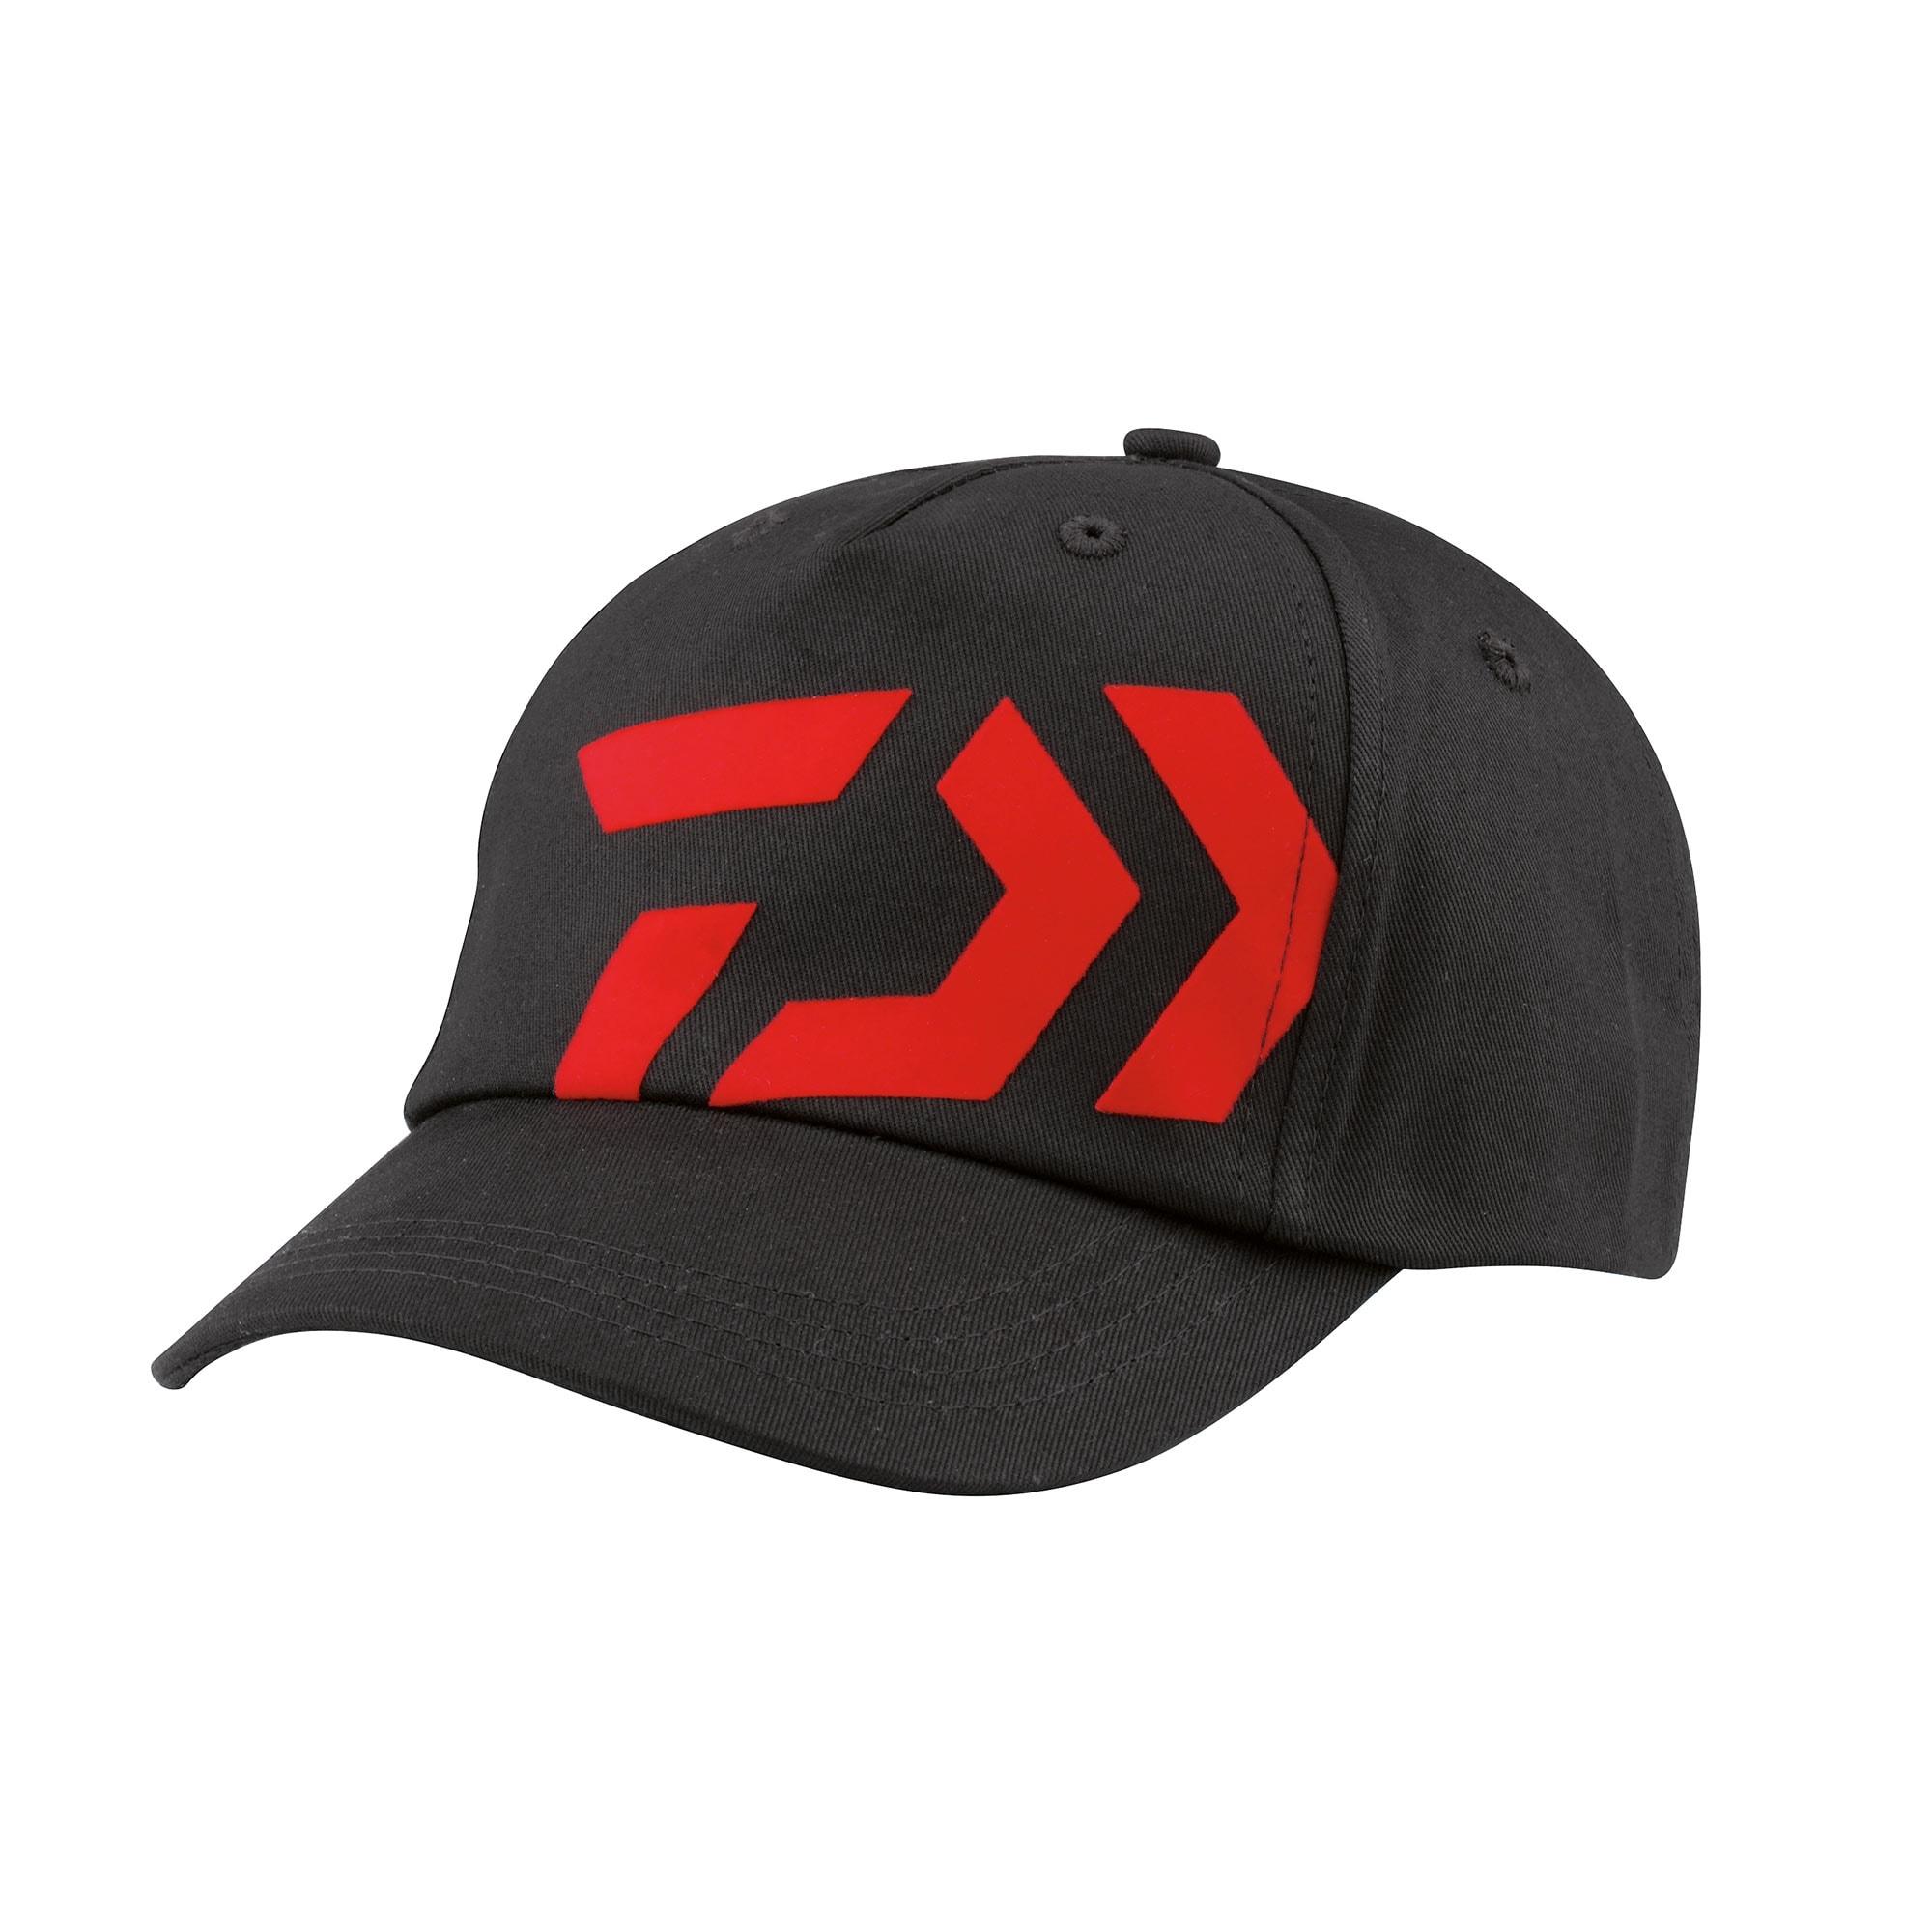 Cappellino black/red DAIWA